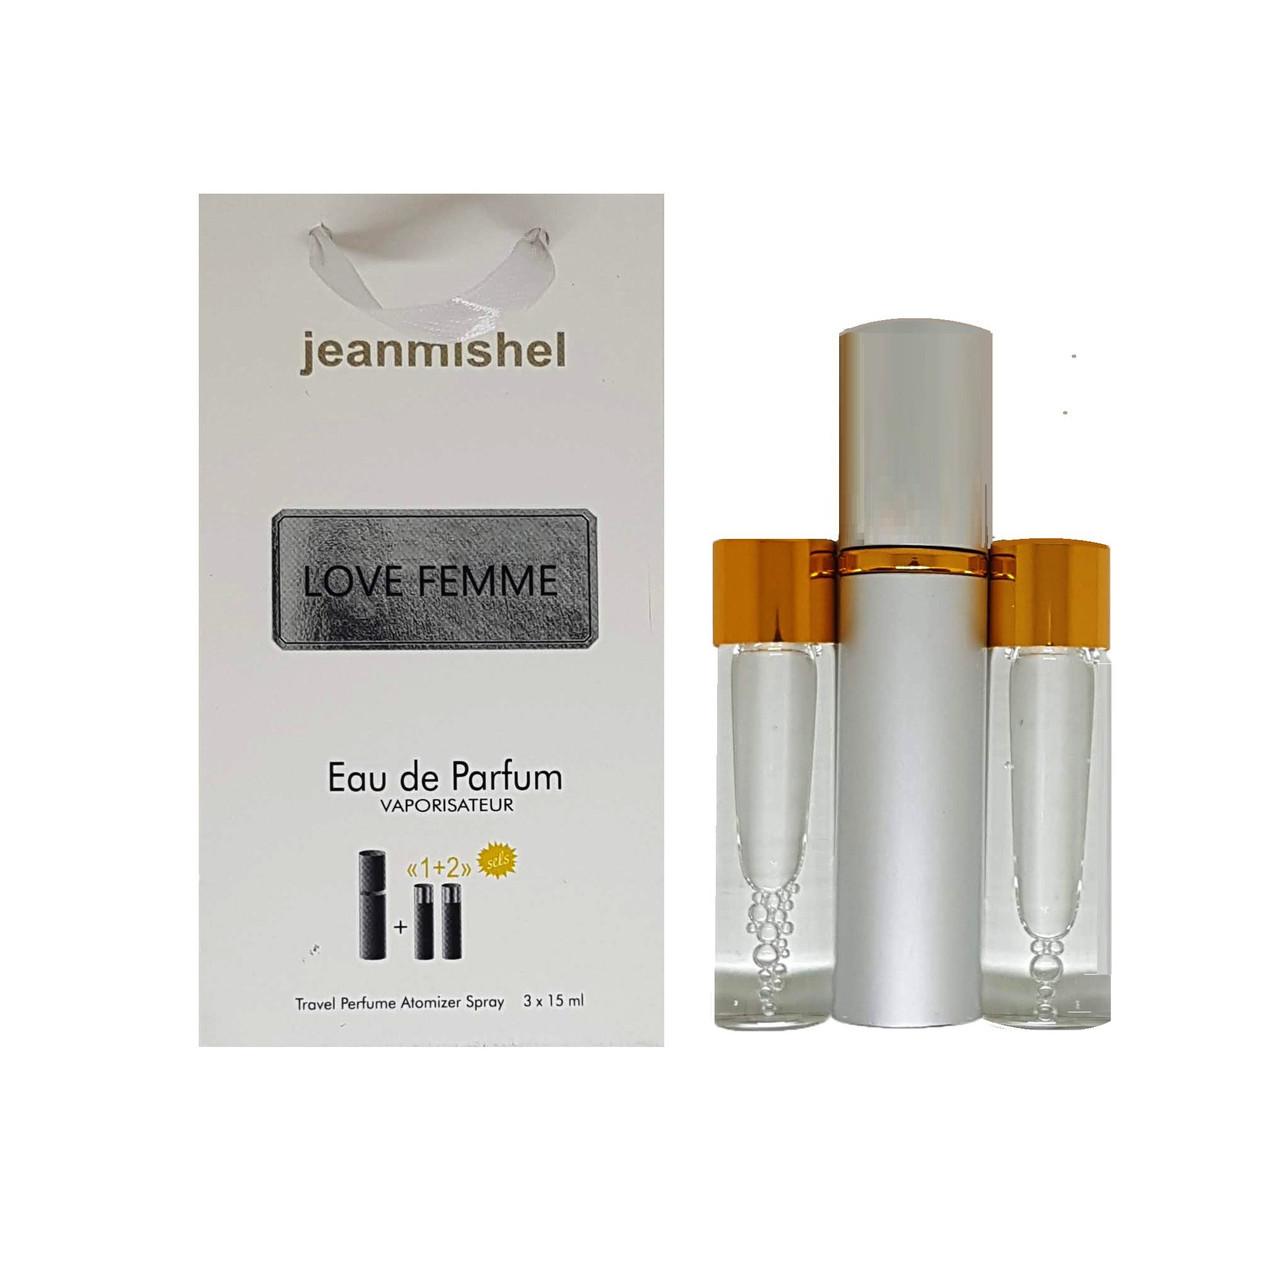 Jeanmishel Love Femme (104) 3 x 15 ml